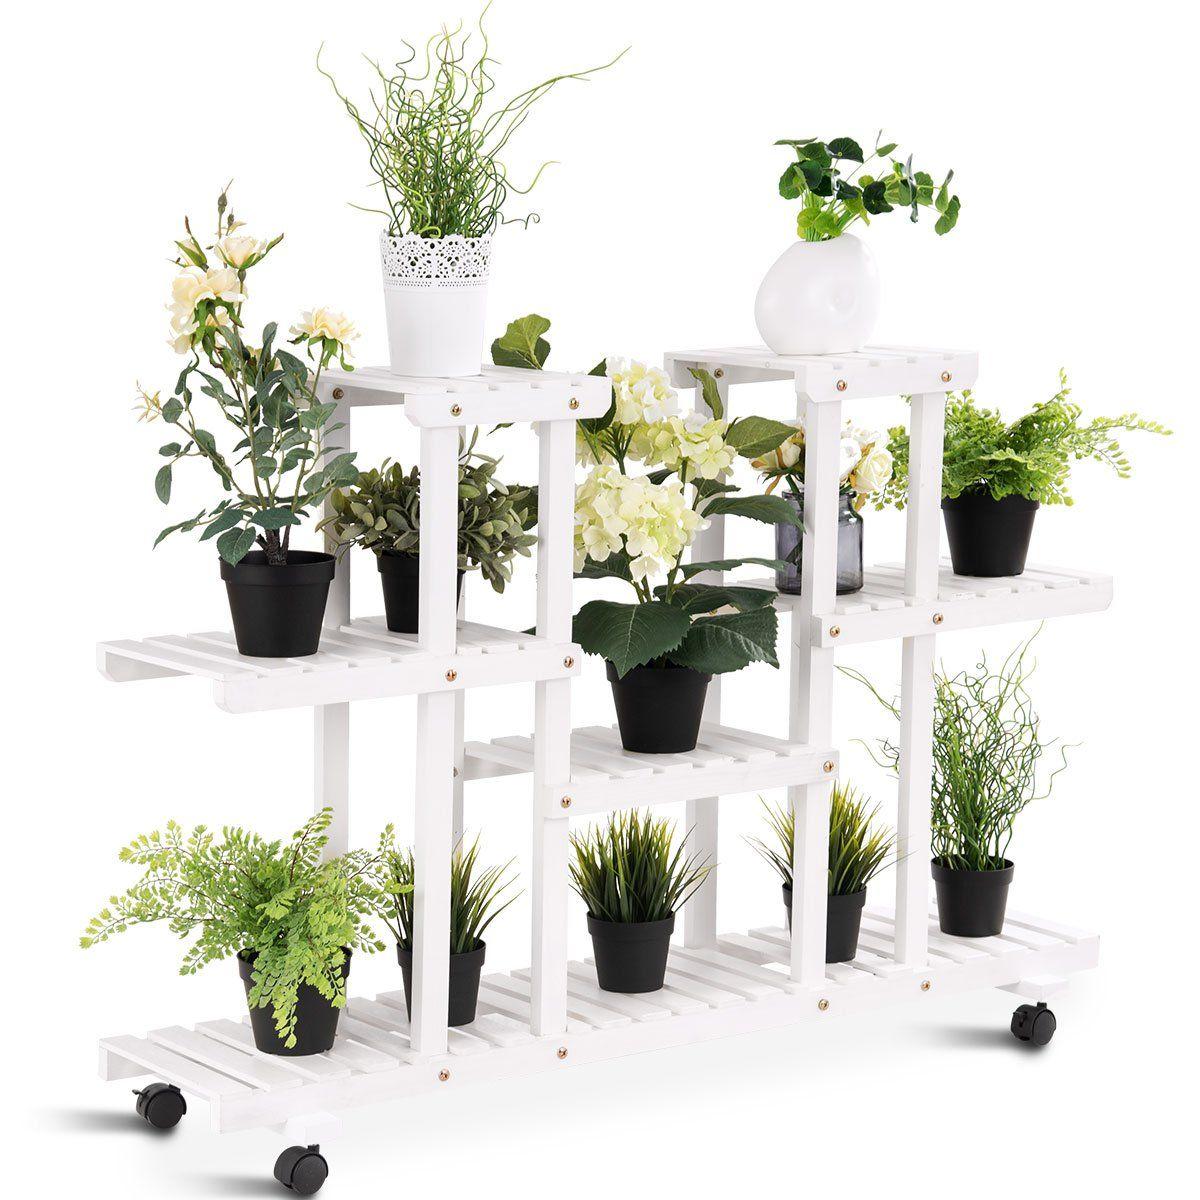 Giantex rolling flower rack wood plant stand on wheels 6